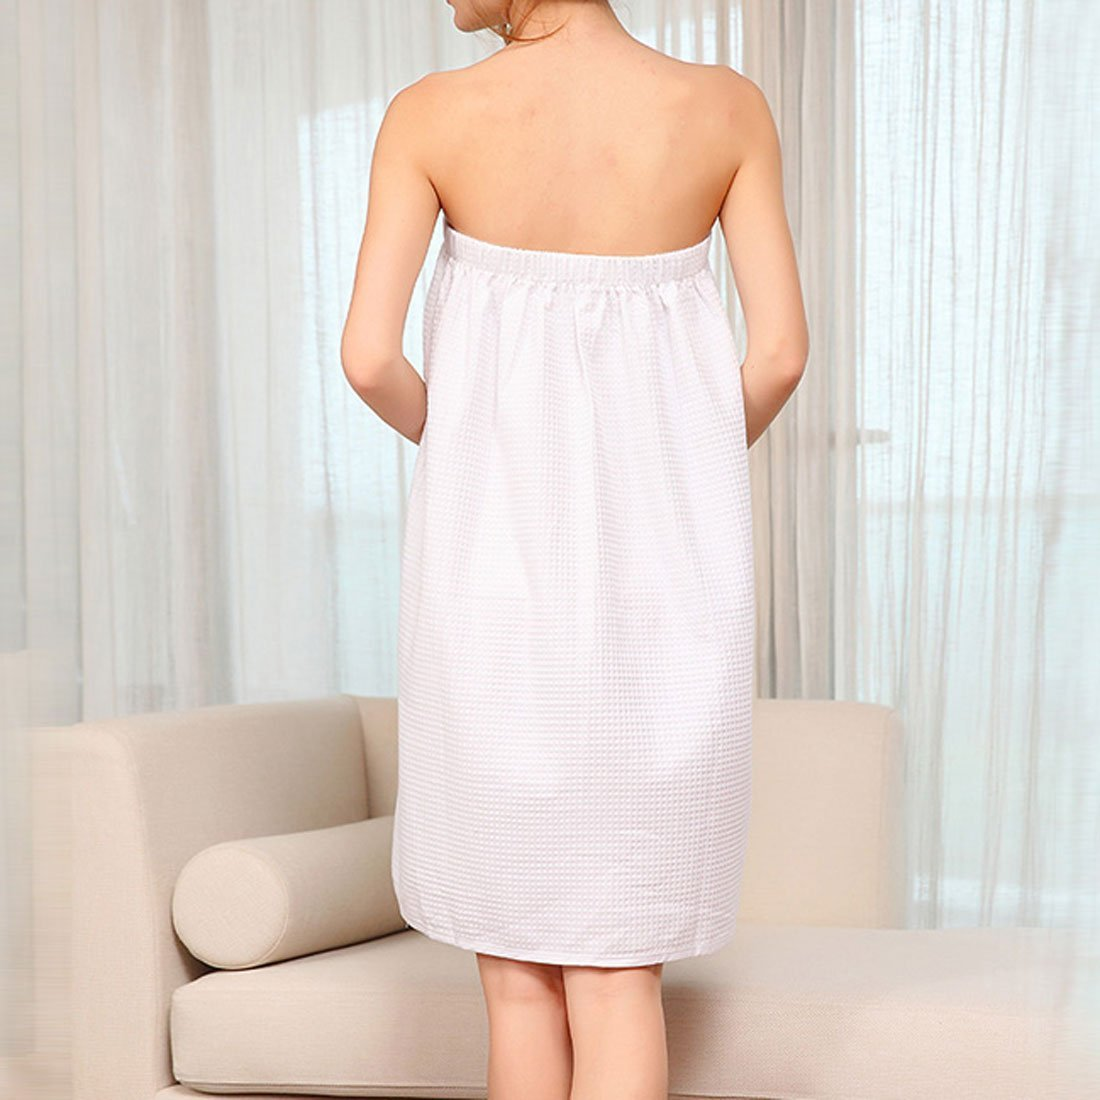 DealMux Cotton Lady Bowknot Adjustable Waffle Spa Bath Body Wrap 74cm Length White